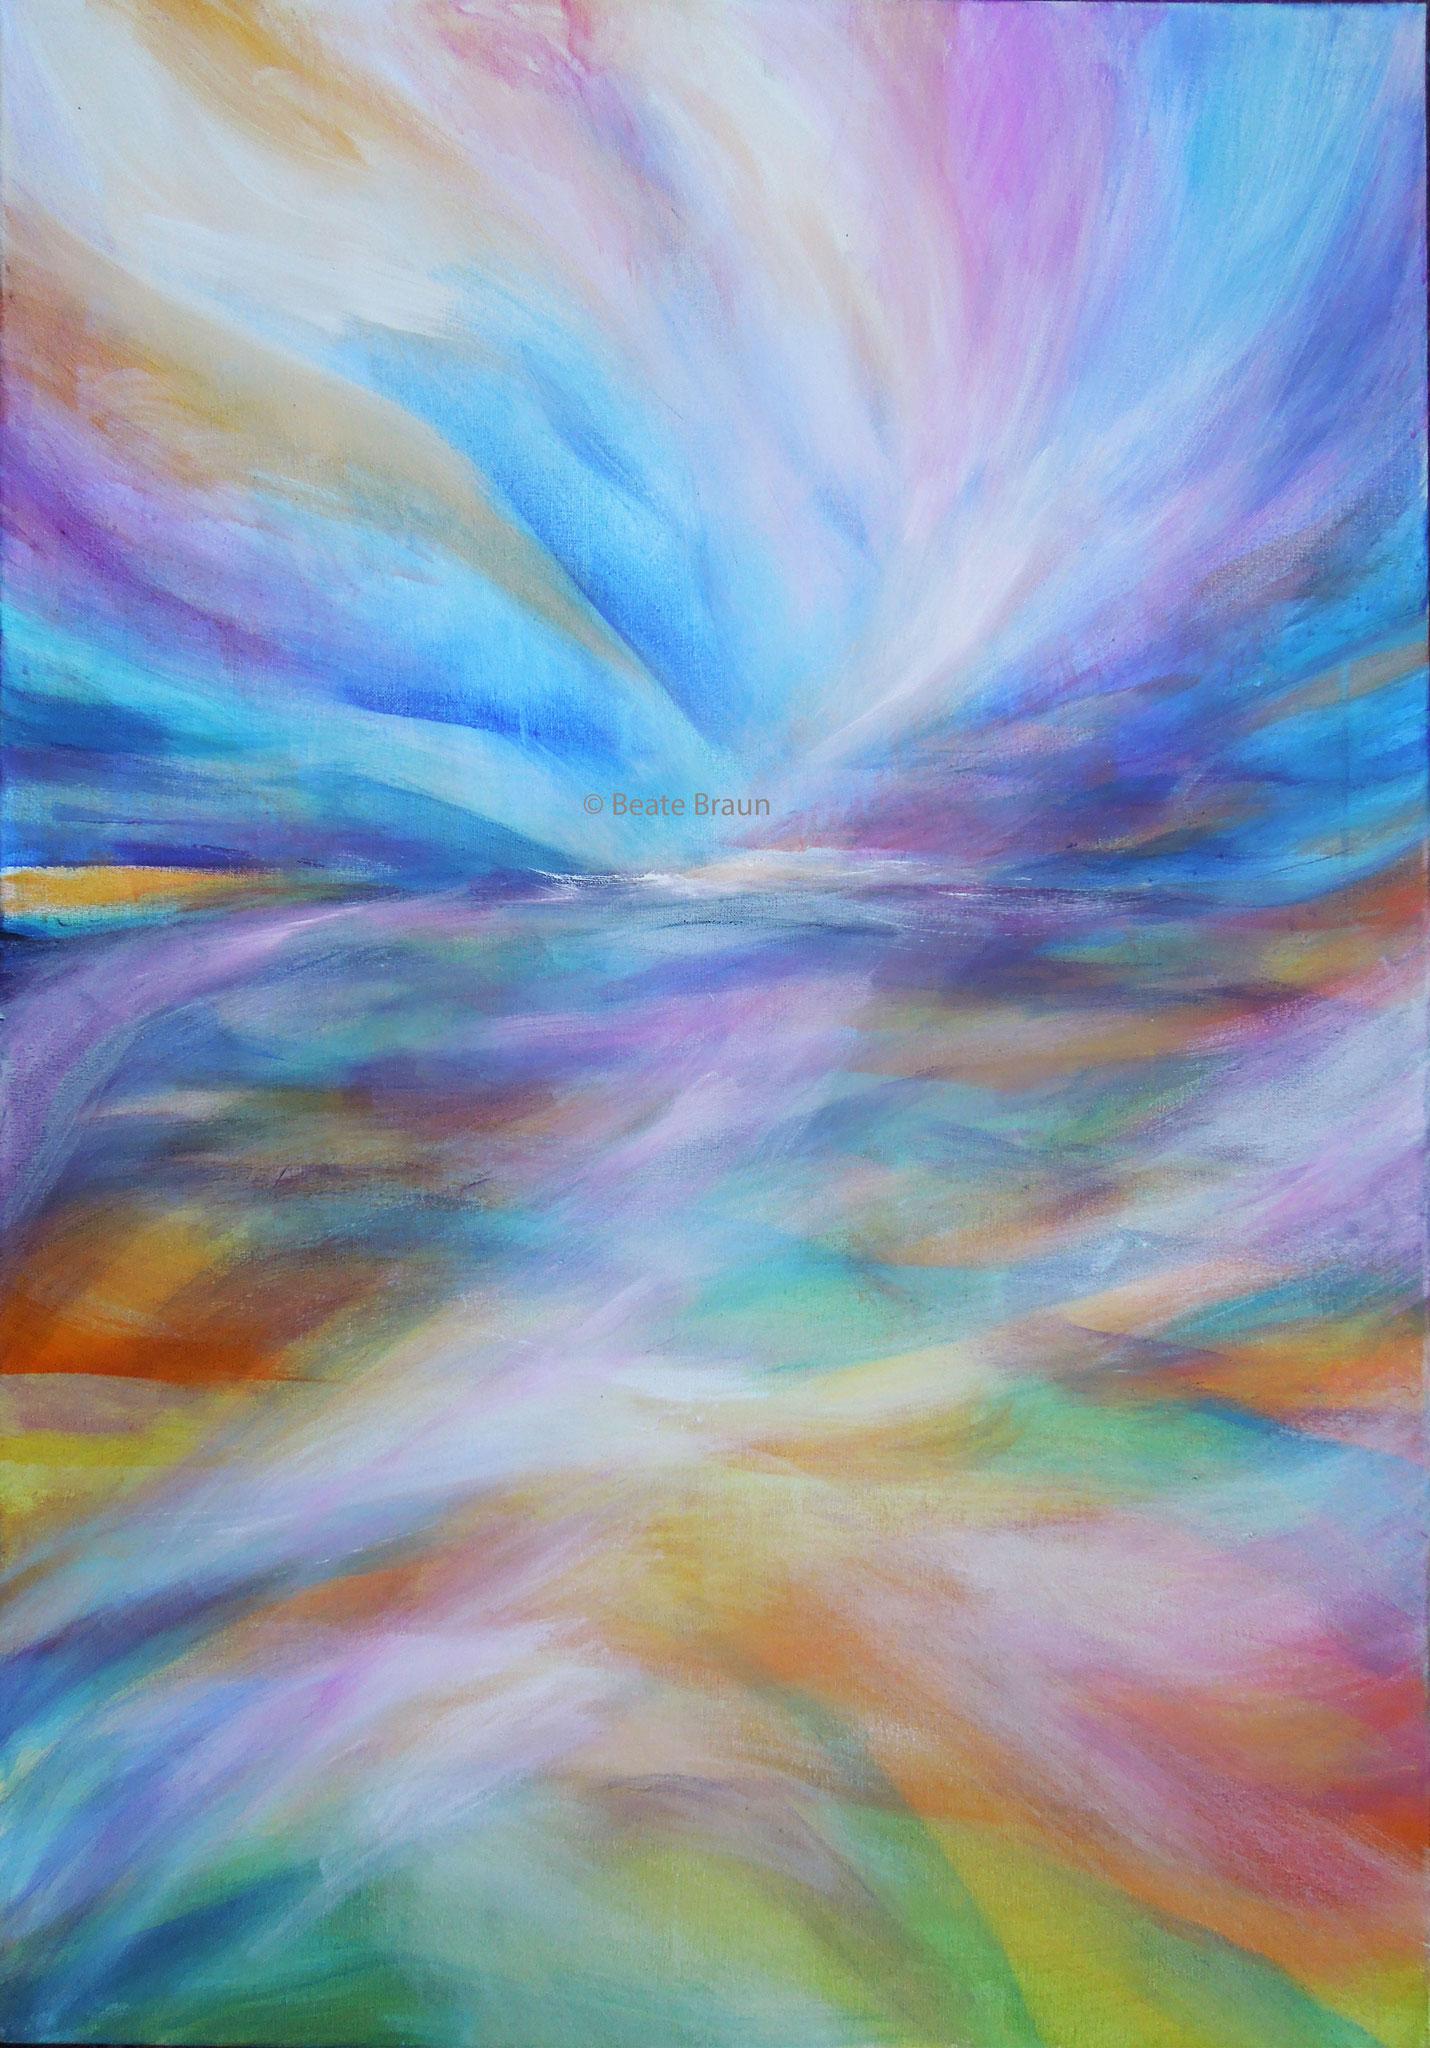 Spiegelung 1 | 70 x 100cm | Acryl auf Leinwand | 2017